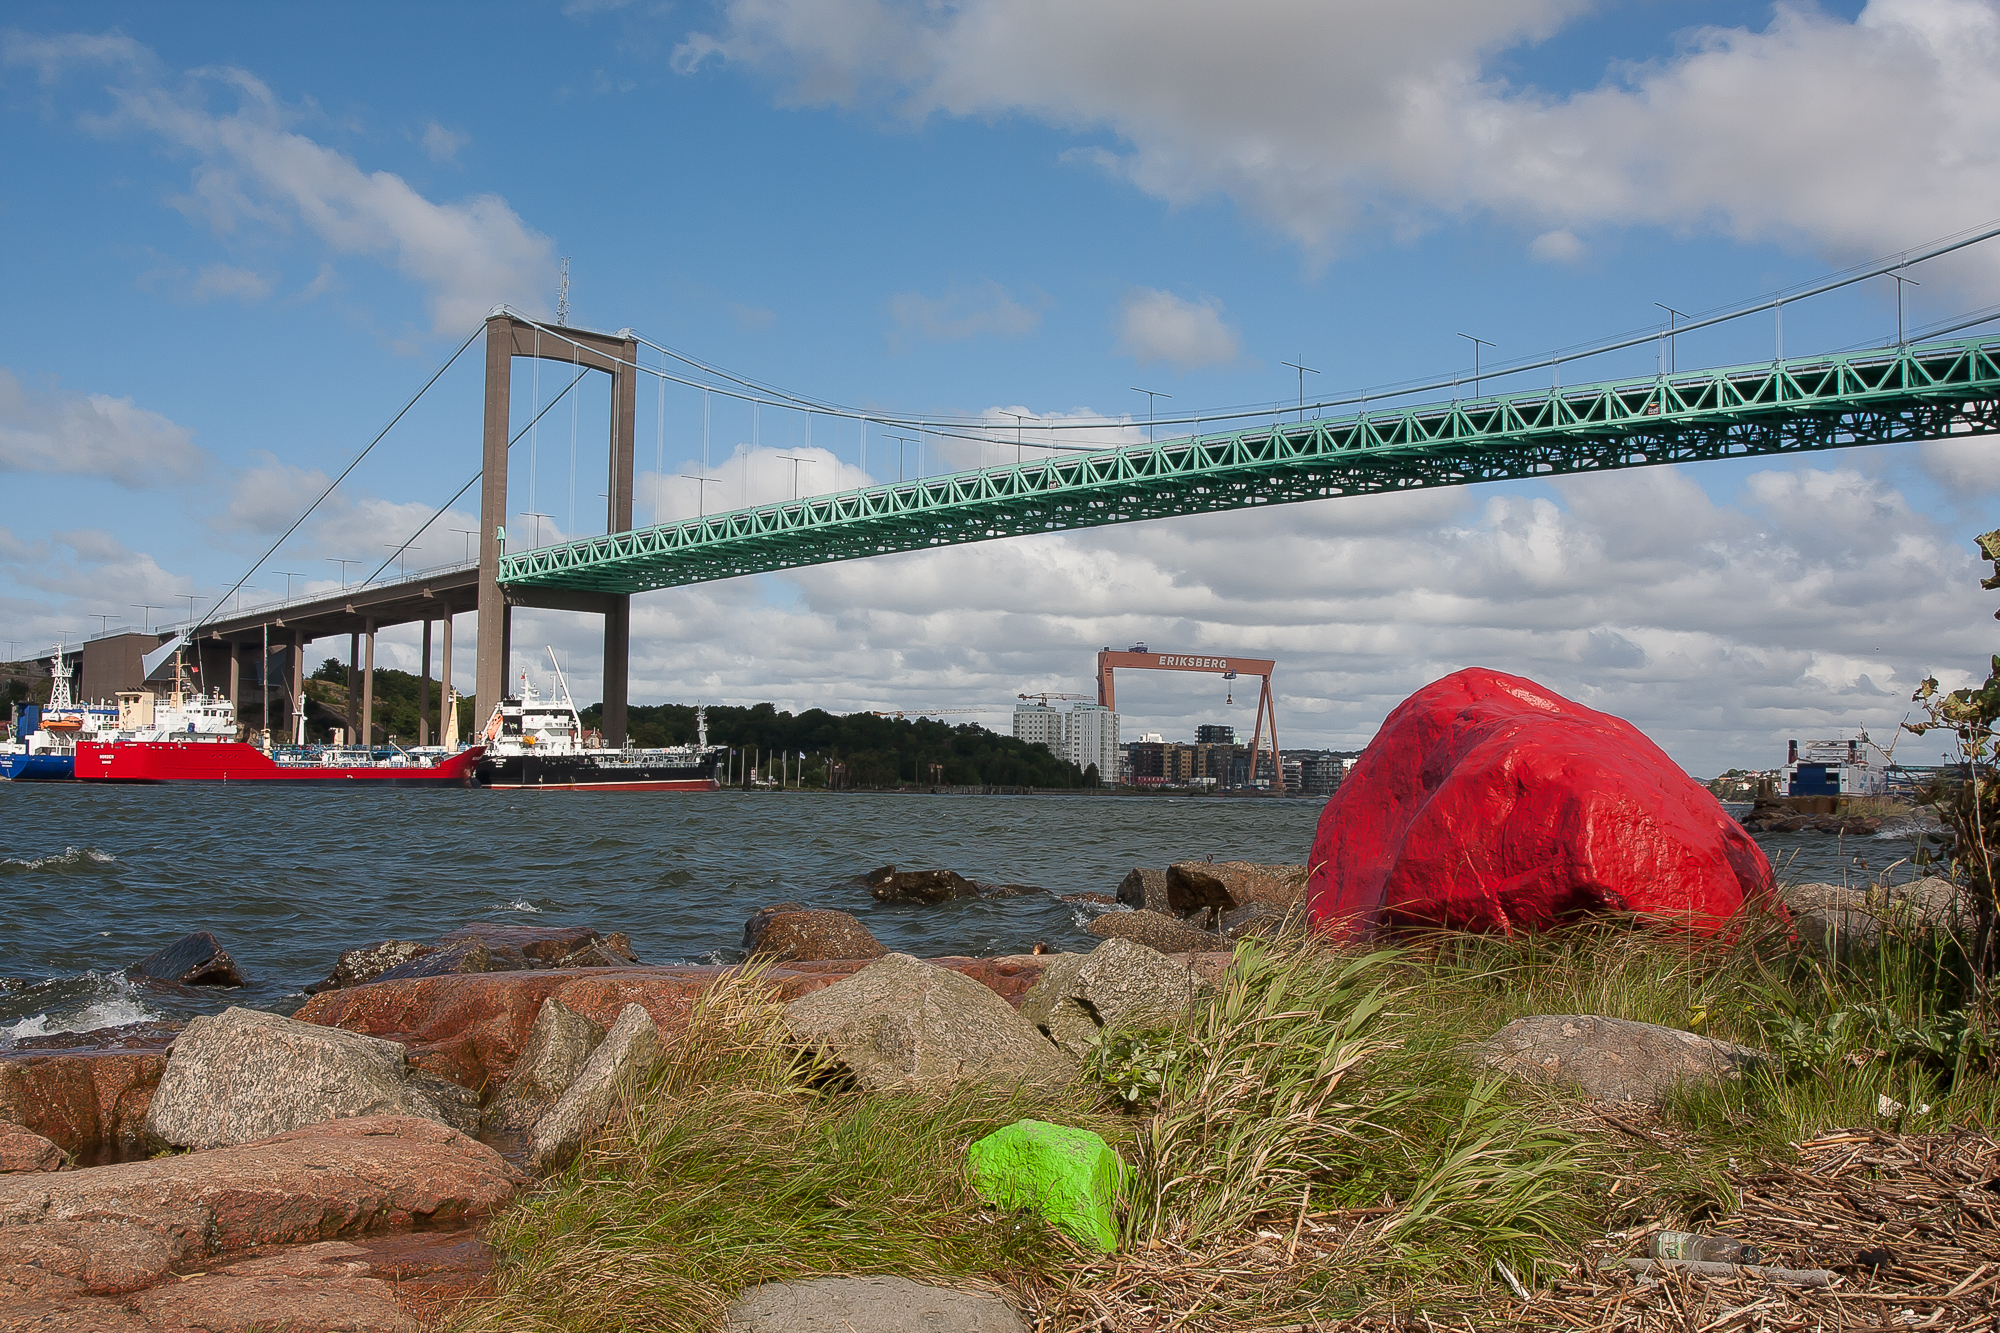 Älvsborgsbron and the redrock